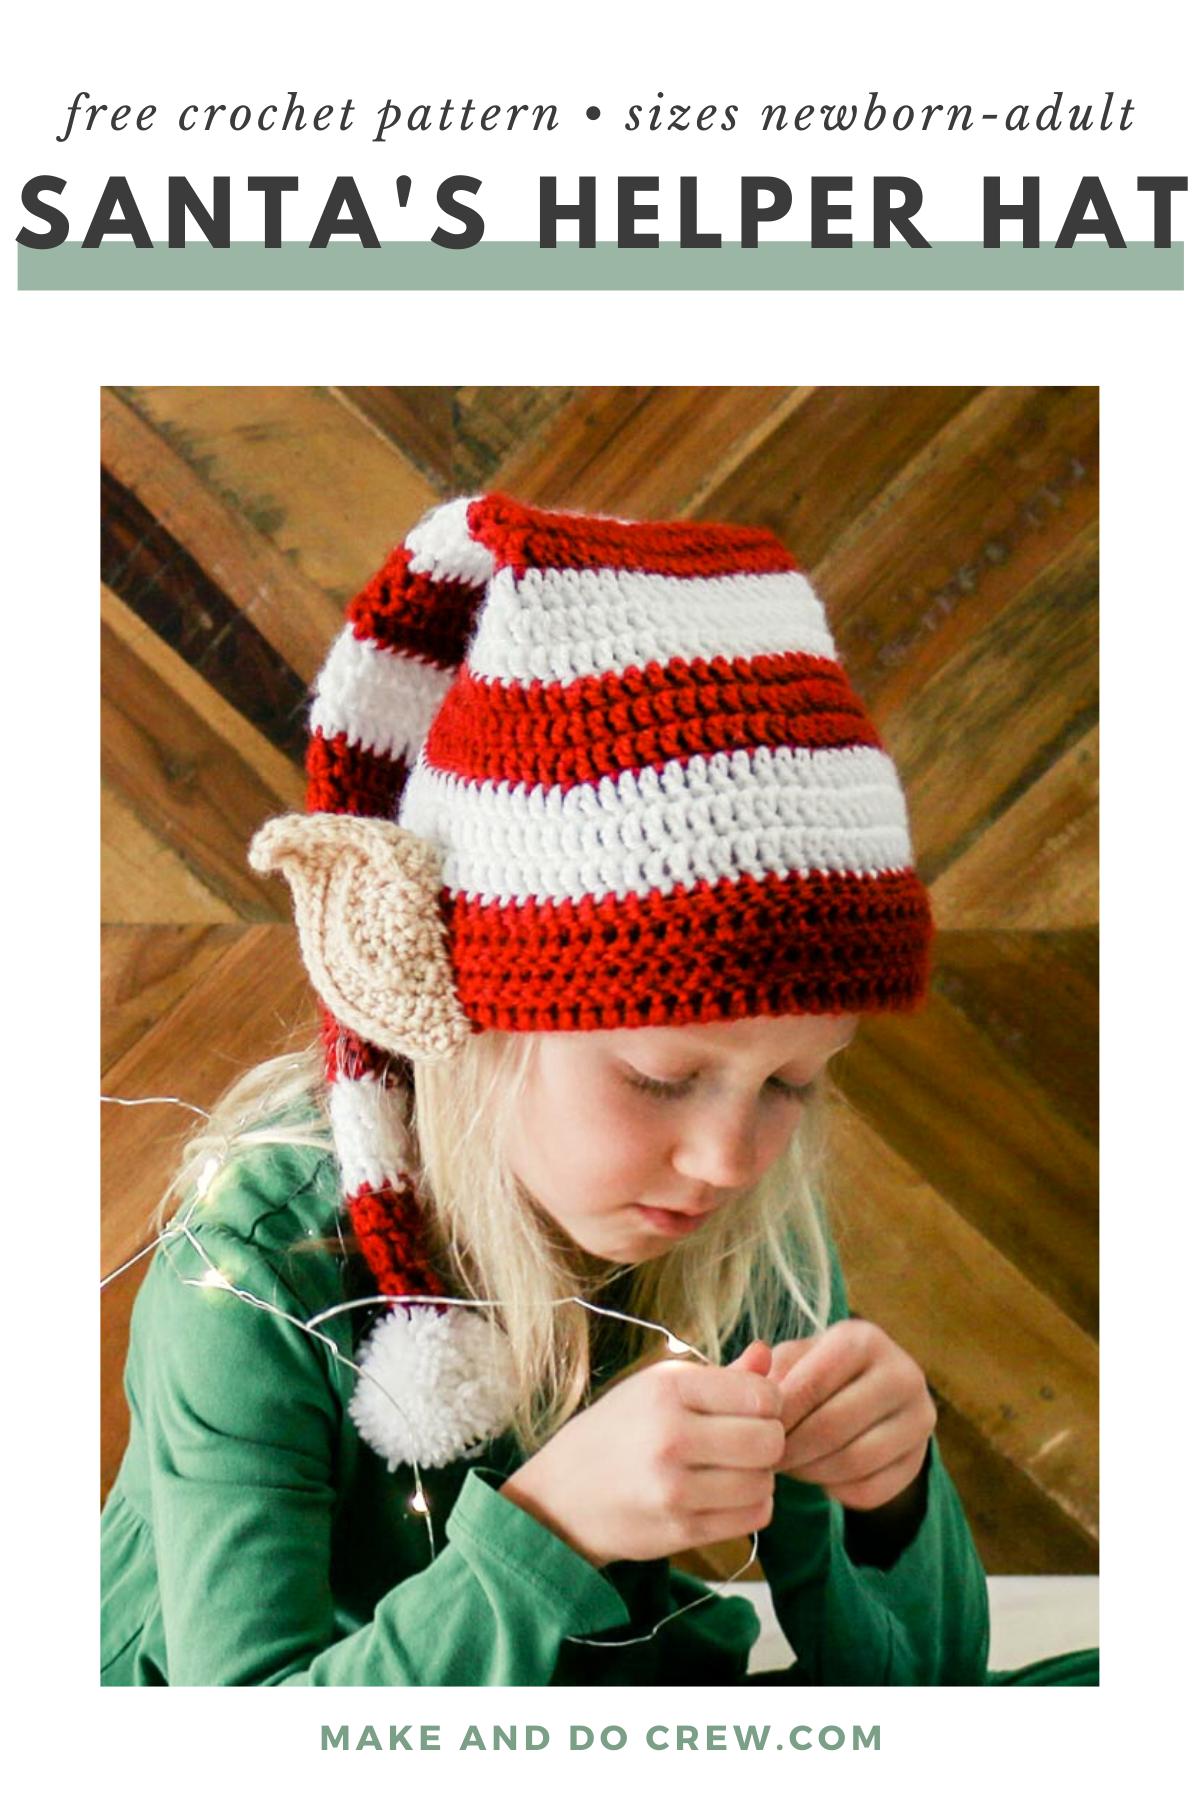 Crocheted Elf Beanie with ears